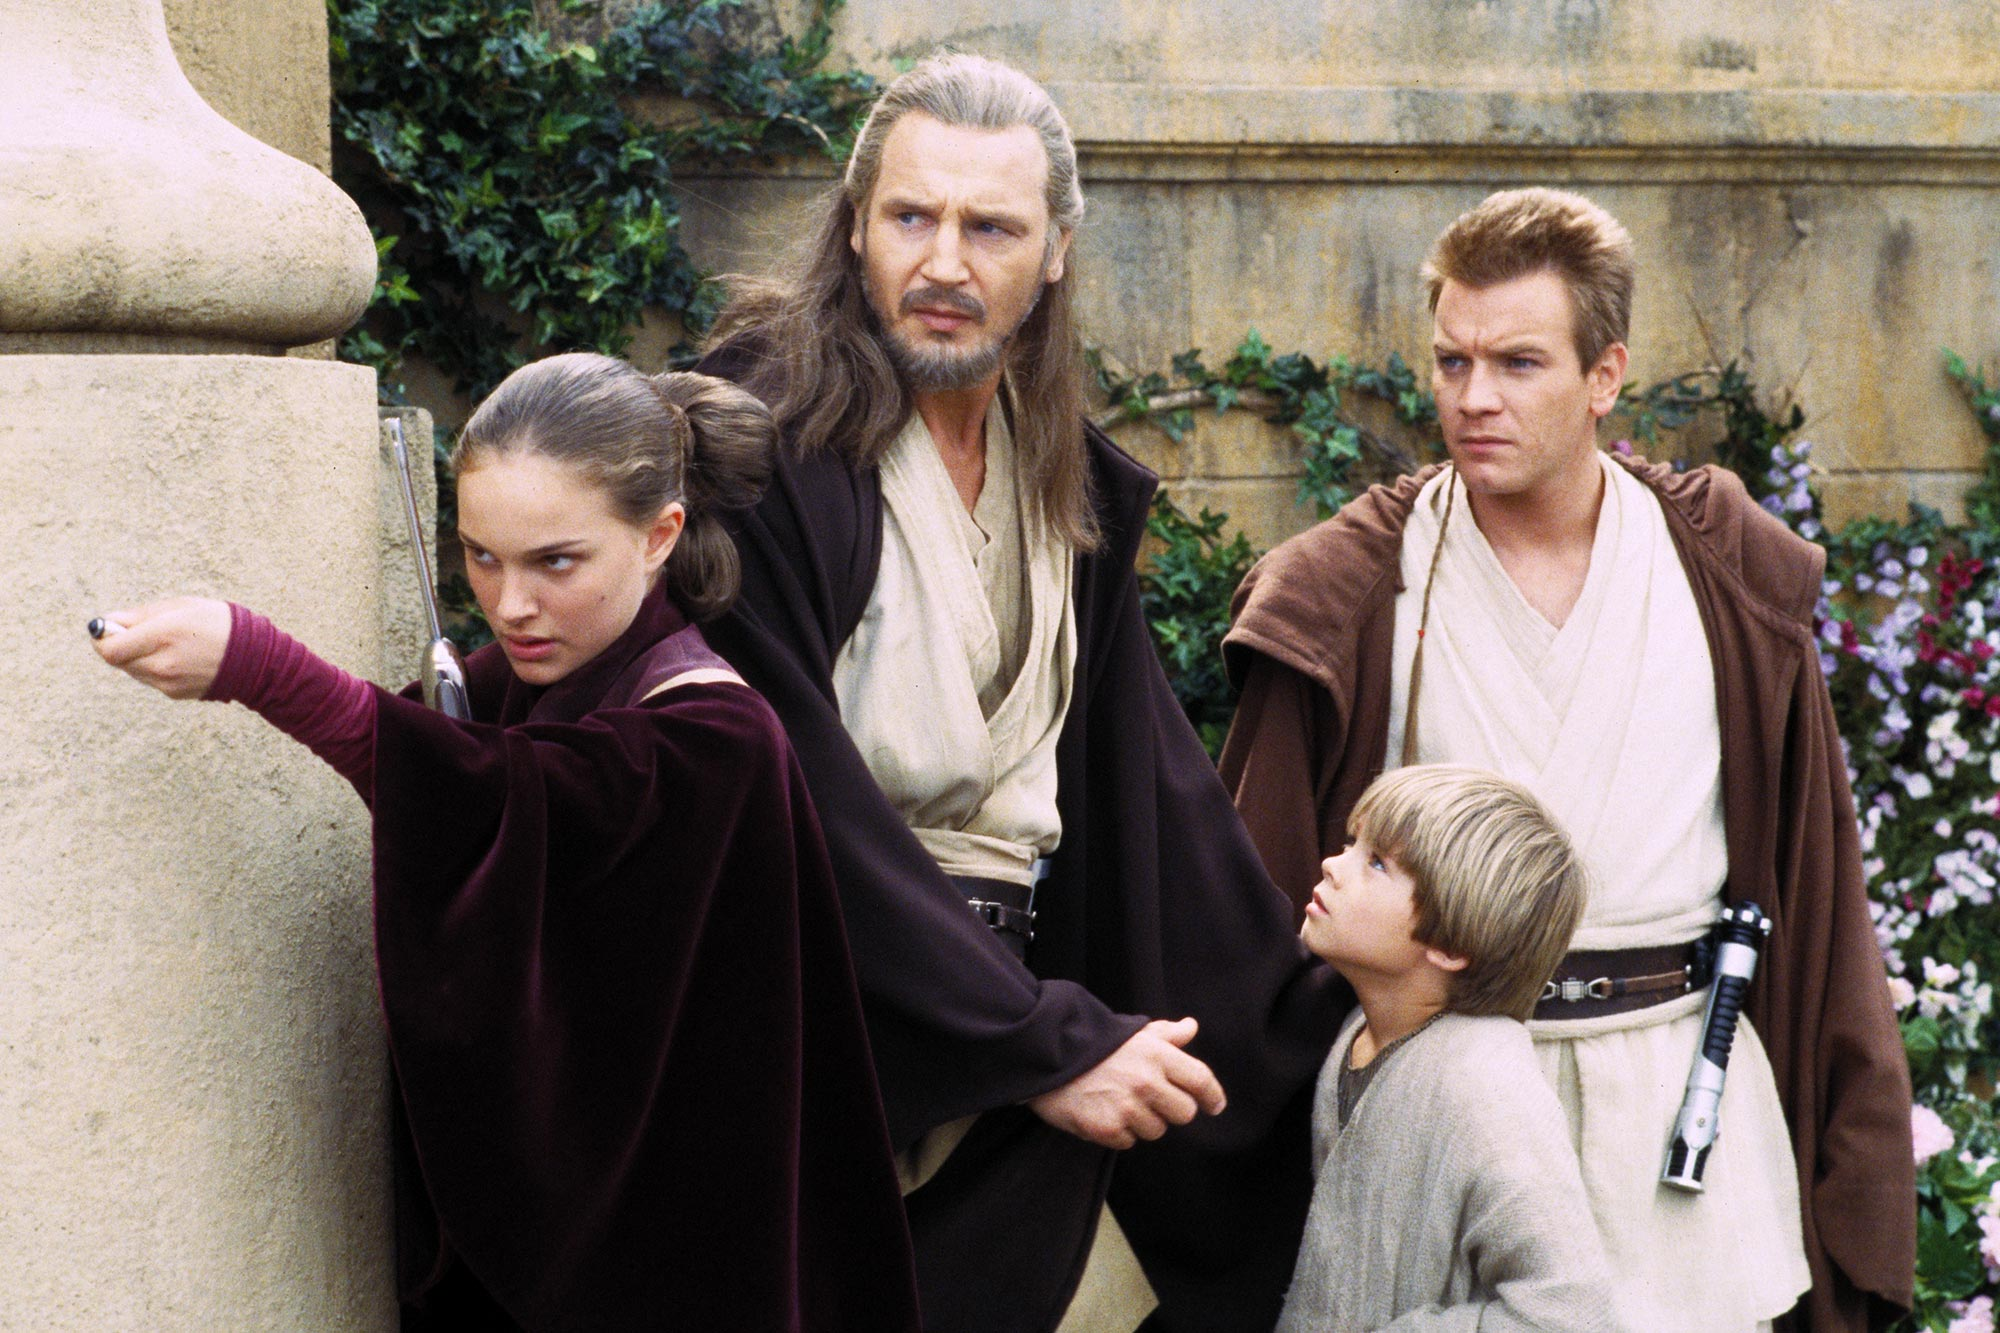 Star Wars Ranking Star Wars: Episode I - The Phantom Menace